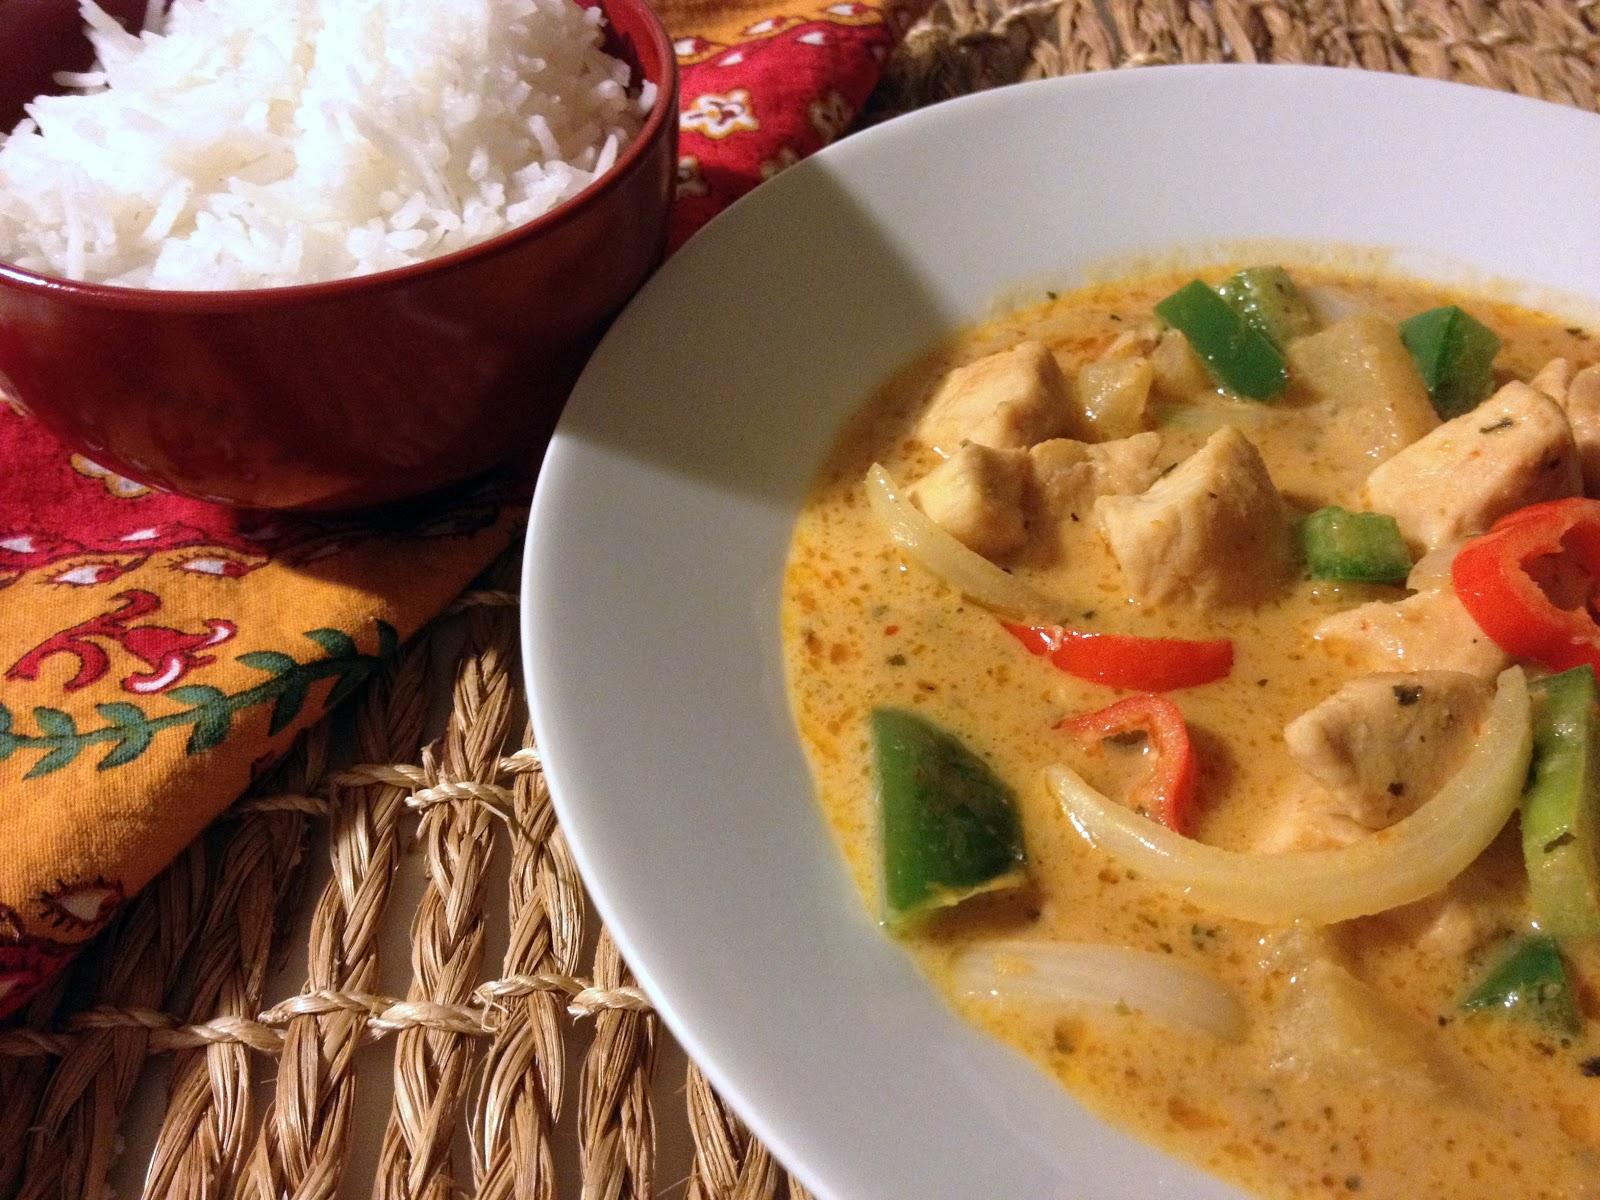 http://2.bp.blogspot.com/-Mw9EjvVz7uI/UHnTRaSoCiI/AAAAAAAADso/_iXG7PeTDKc/s1600/curry+de+pollo.jpg